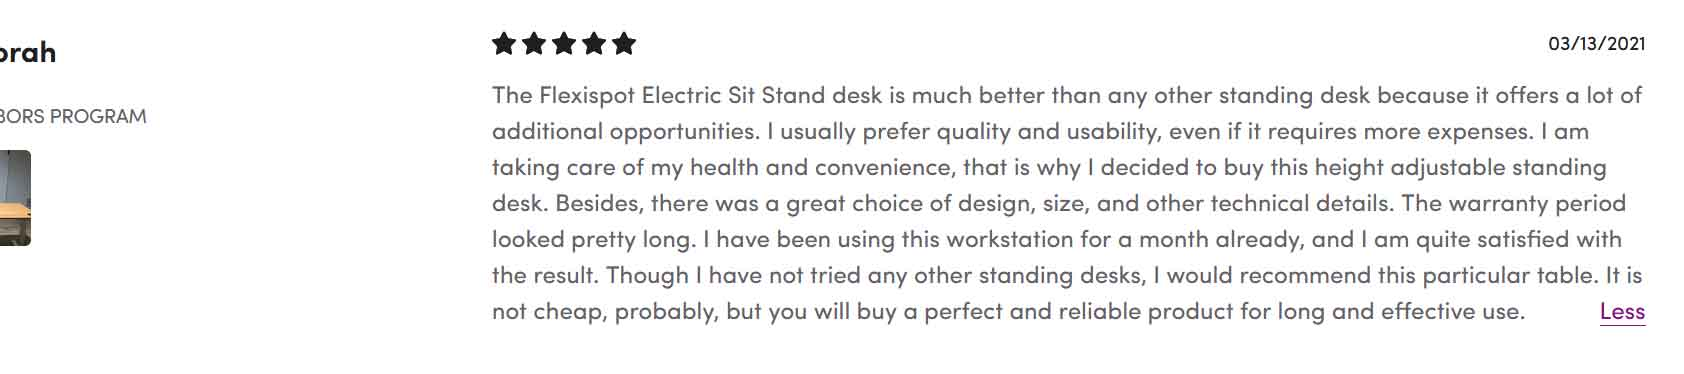 Flexispot Desk Review 3